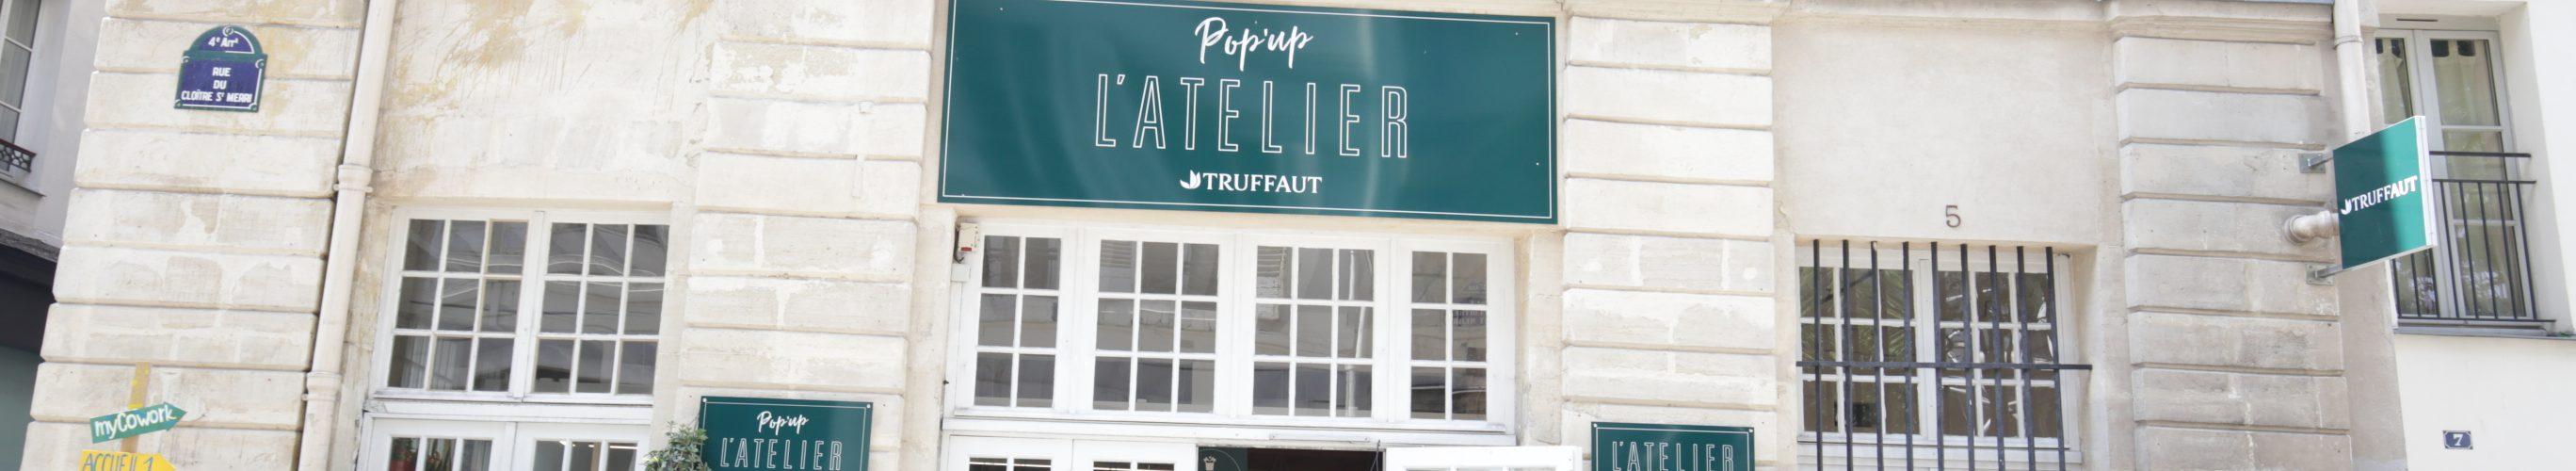 Pop-up store truffaut